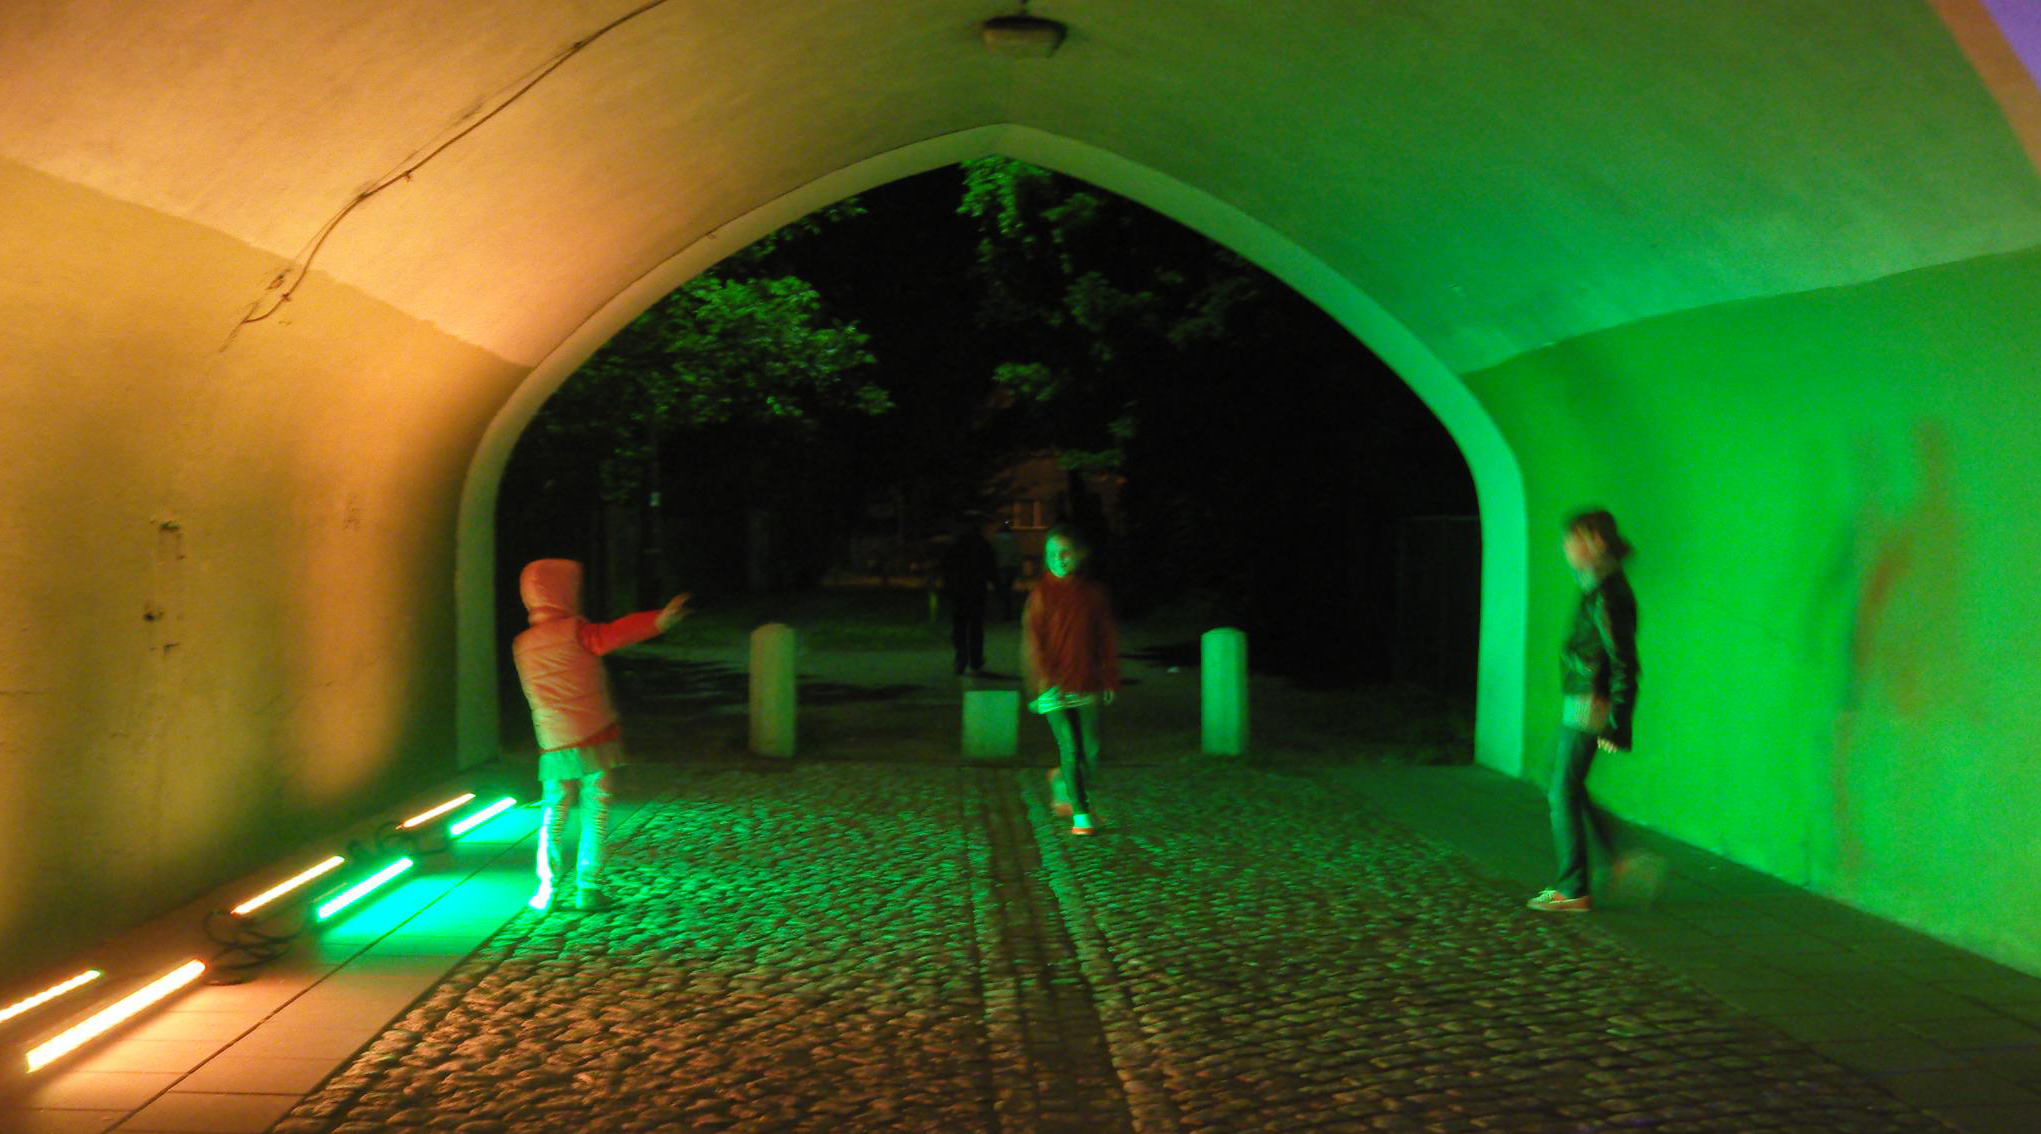 arch lights